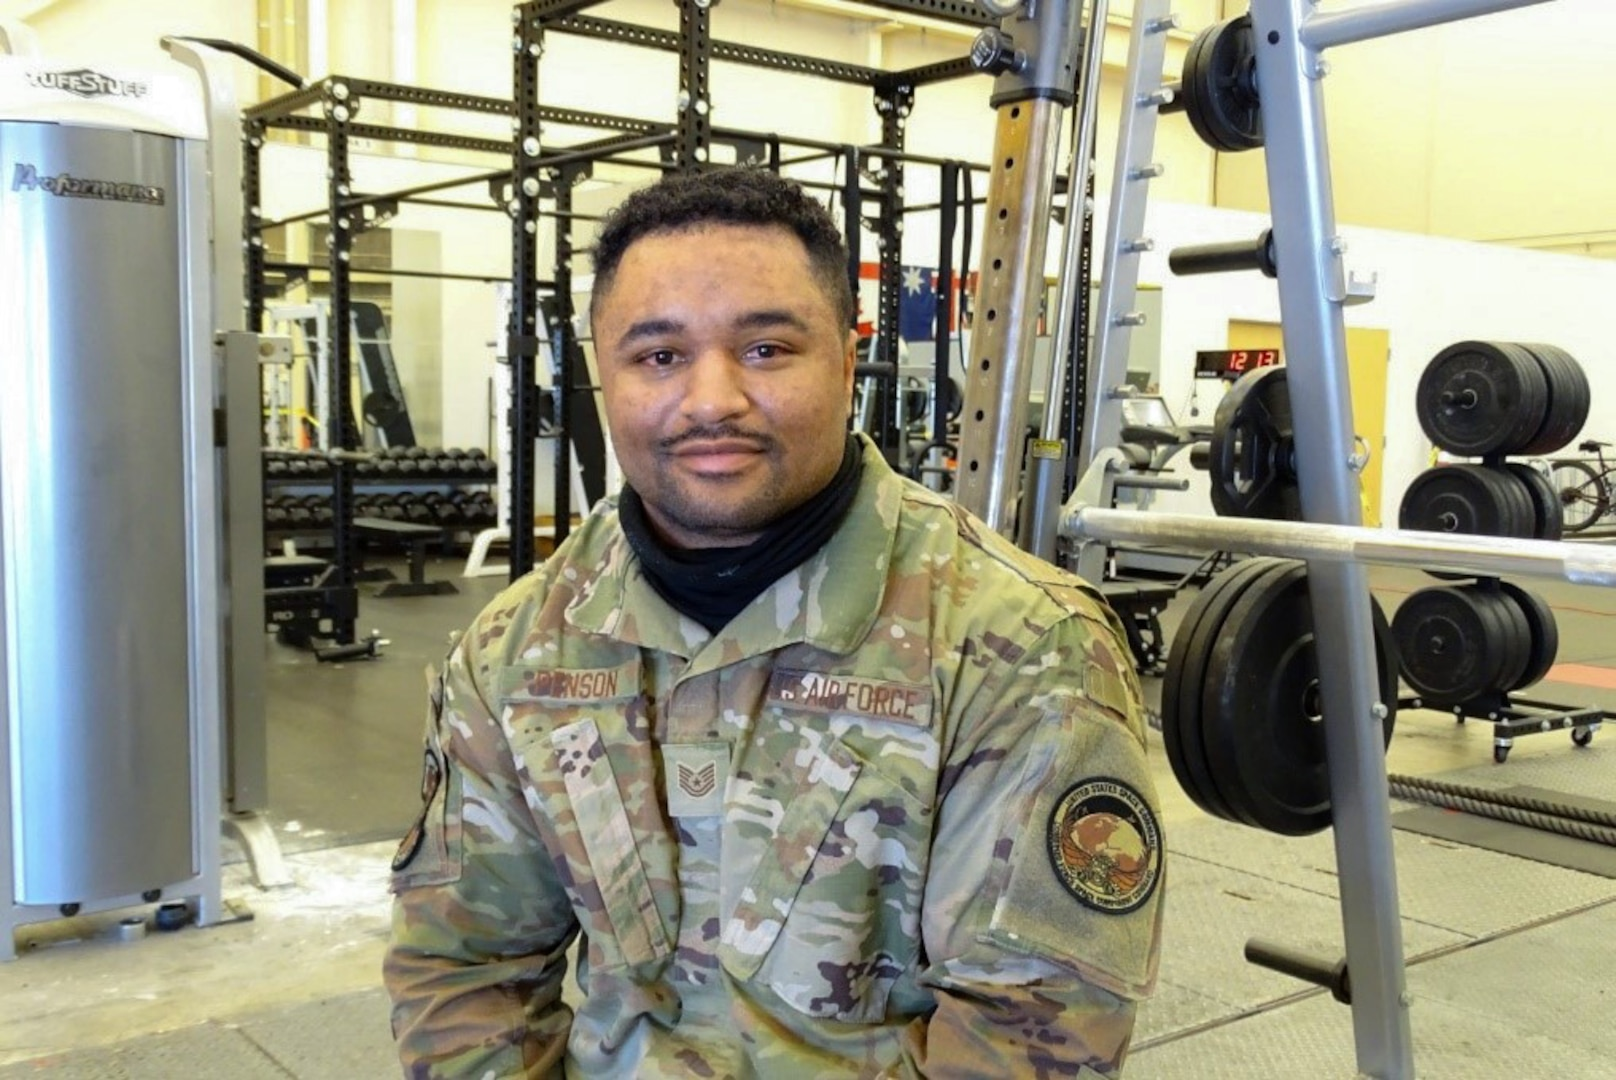 Photo of Technical Sergeant Chad Penson